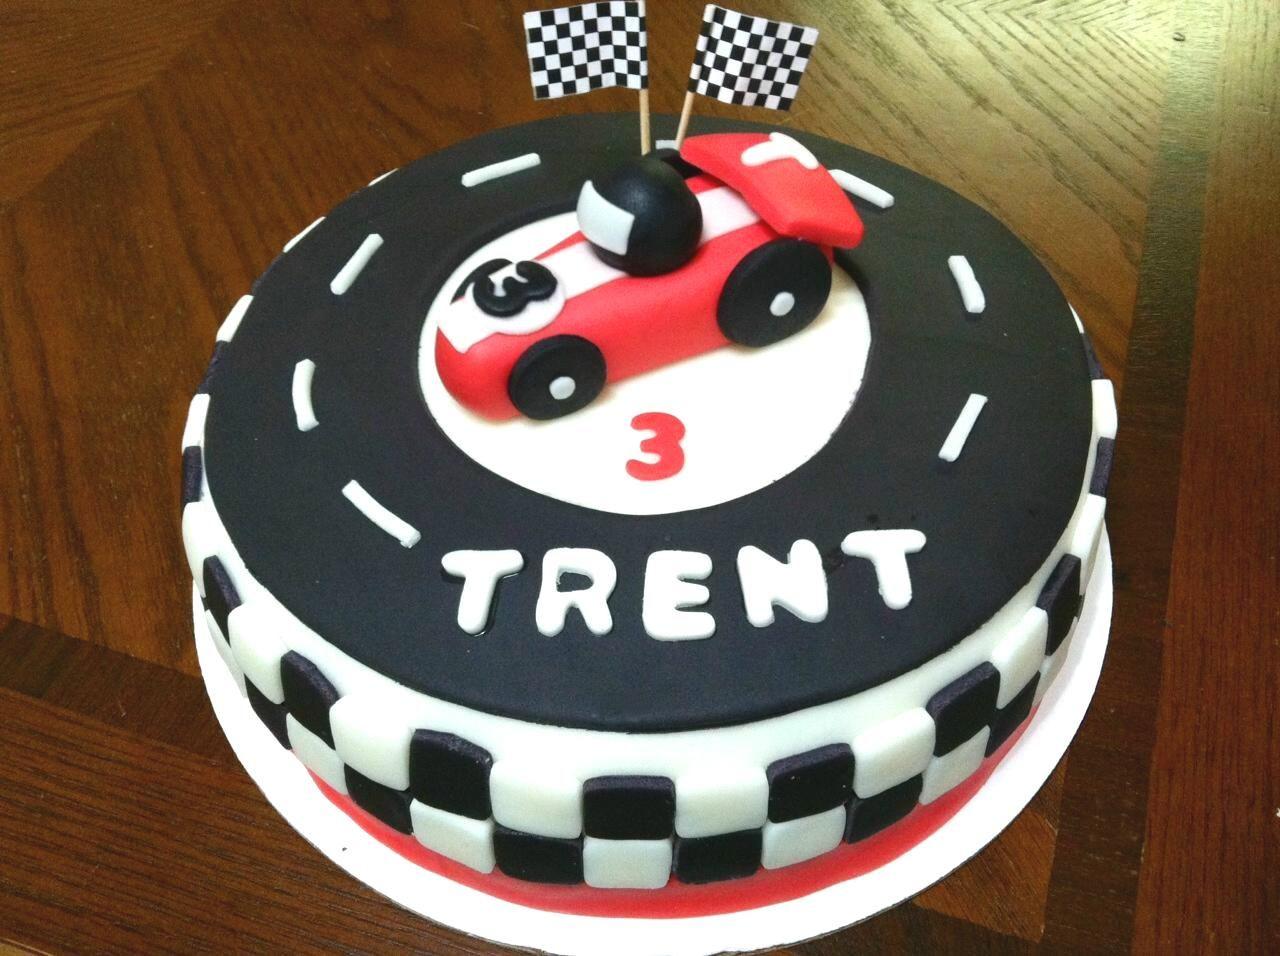 Chocolate vegan race car birthday cake My cakes Pinterest